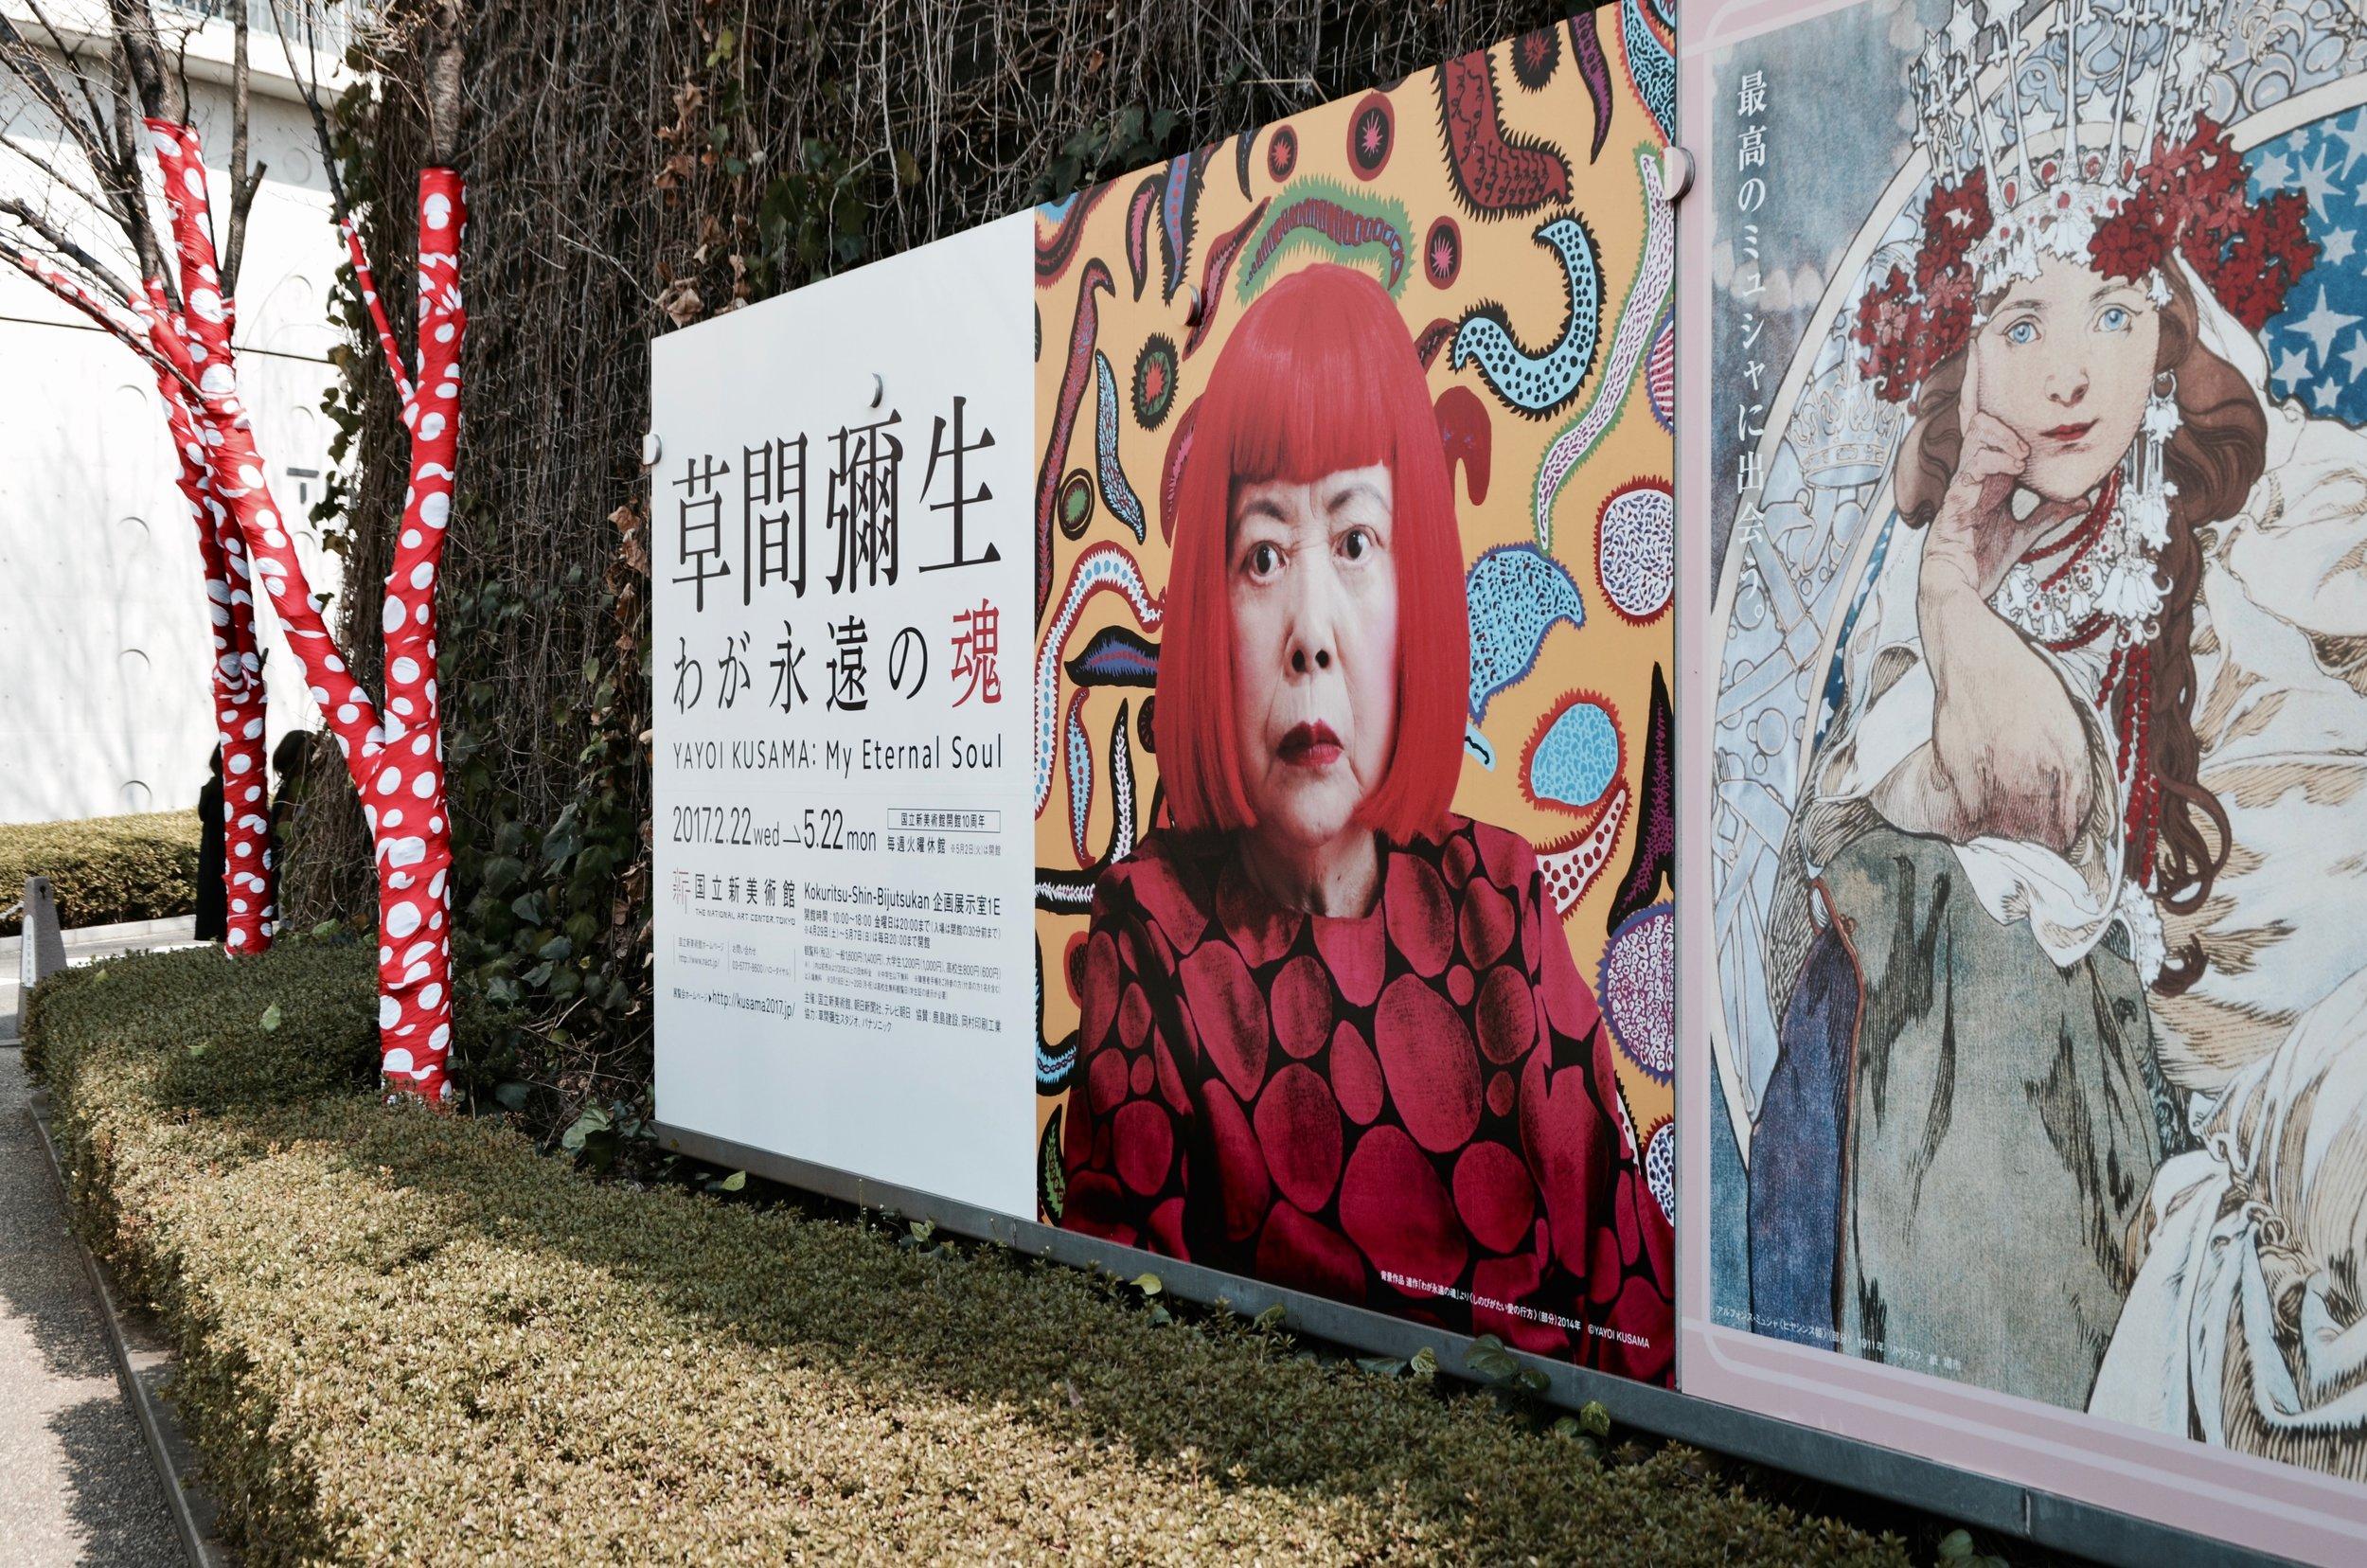 06449 YAYOI KUSAMA Mini Poster Flyer 2017 My Eternal Soul TOKYO